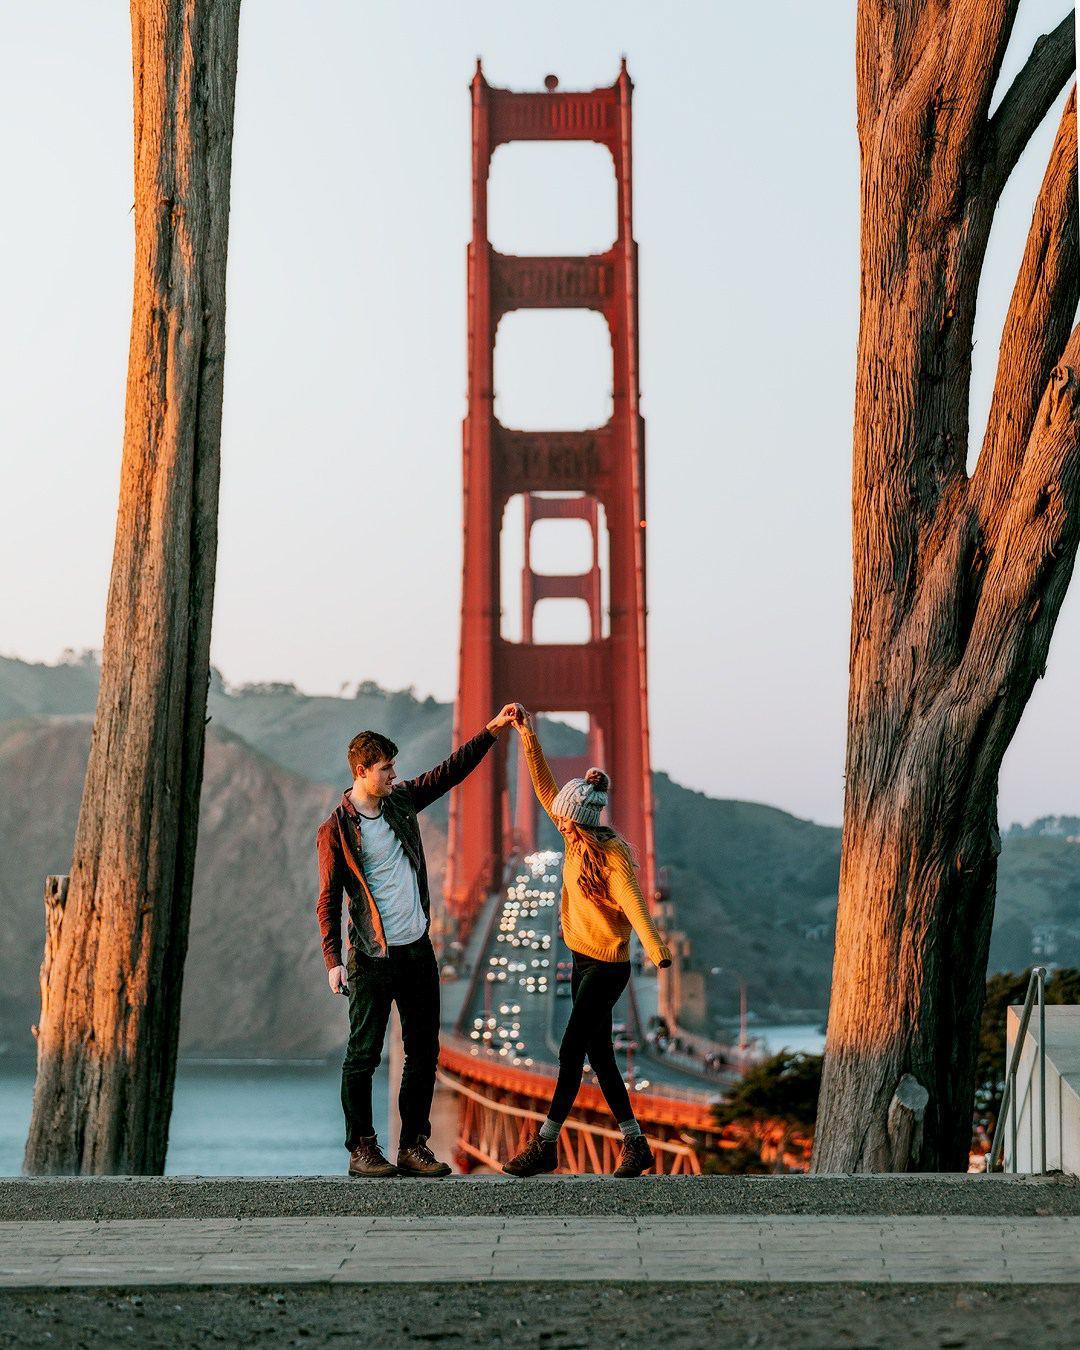 Golden Gate Overlook, Langdon Court, San Francisco. Photo courtesy of Renee Roaming.